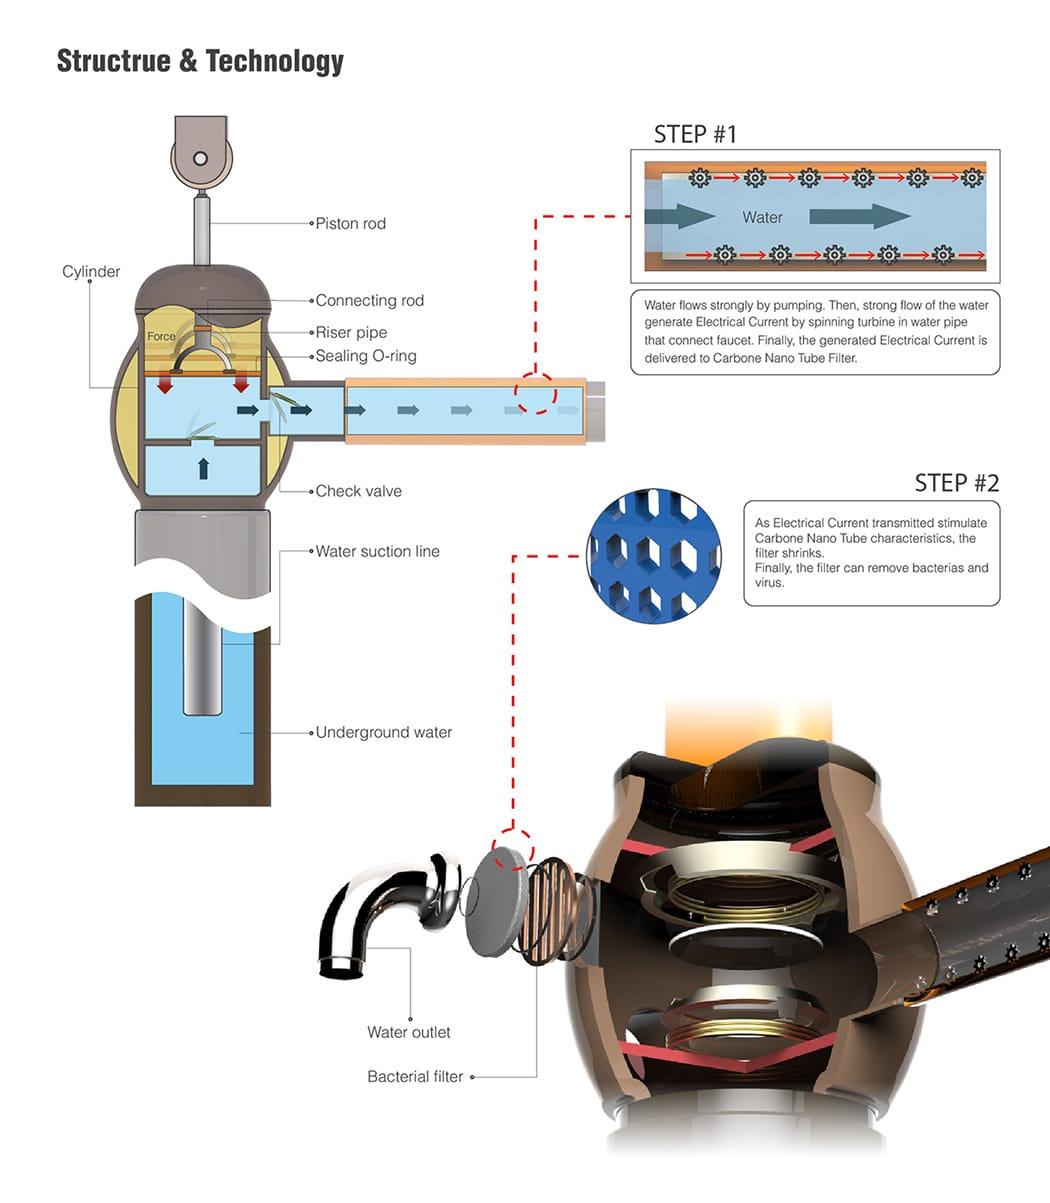 Columpio para sacar agua de un pozo sin electricidad tecnologia